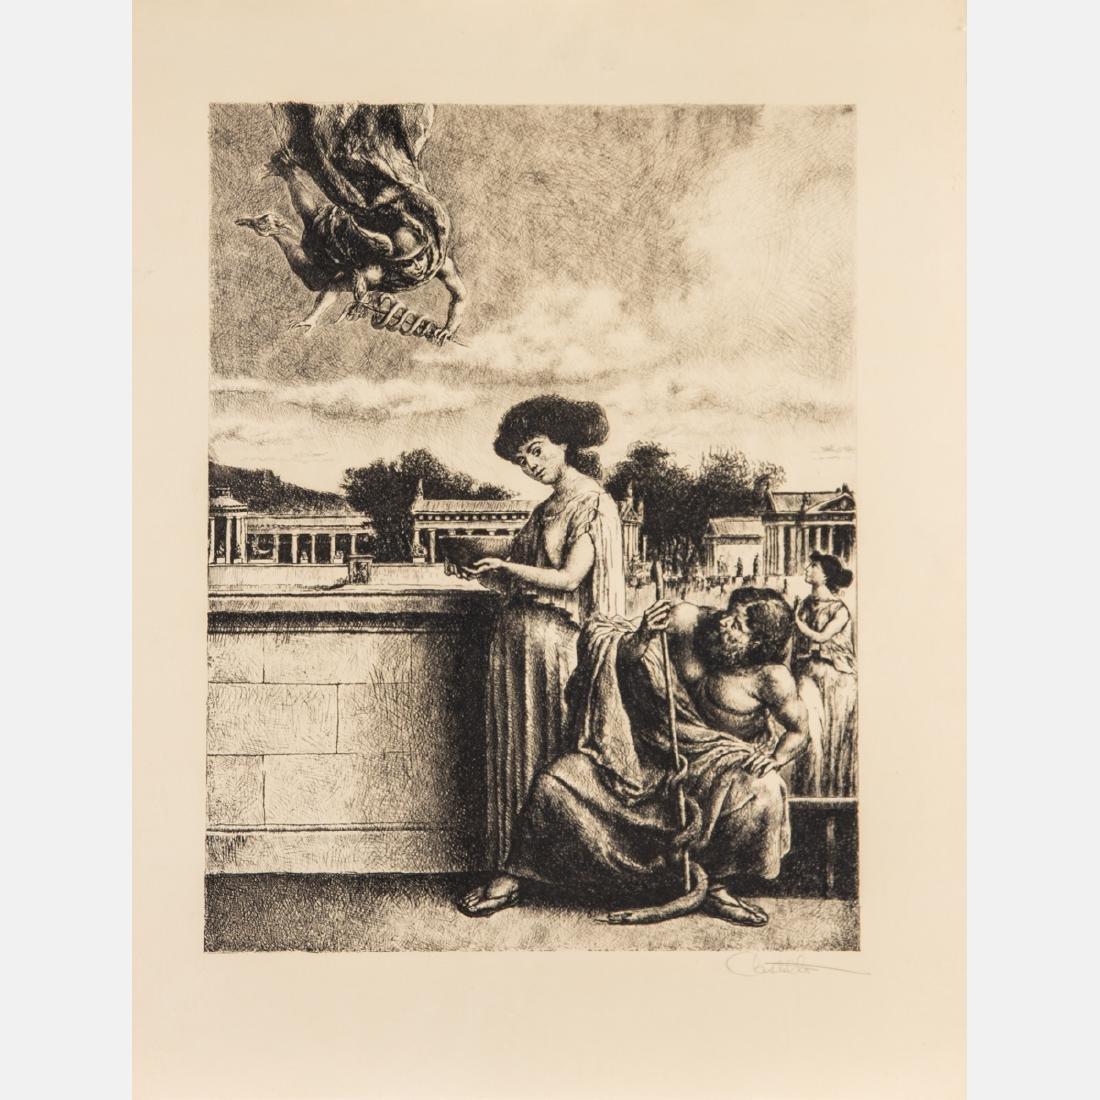 Federico Castellon (1914-1971) Hermes and Panacea,